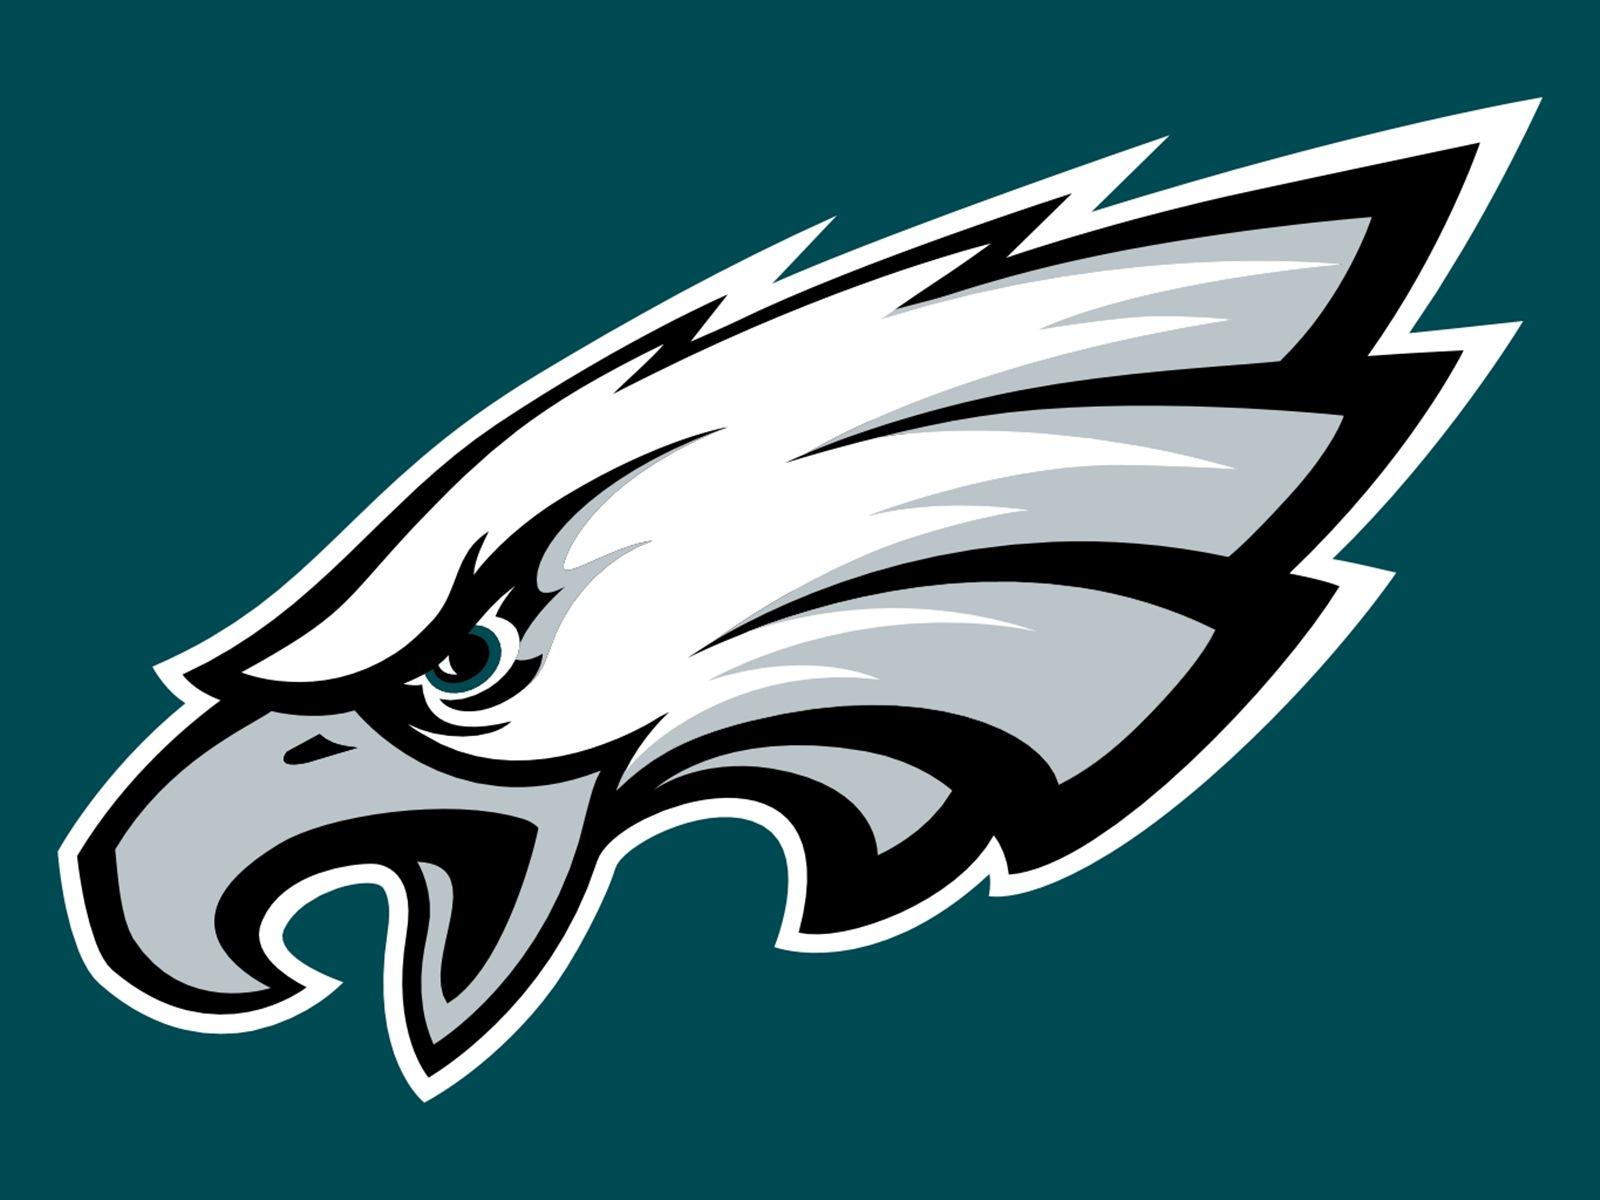 philadelphia eagles logo wallpaper Philadelphia Sports Nation 1600x1200